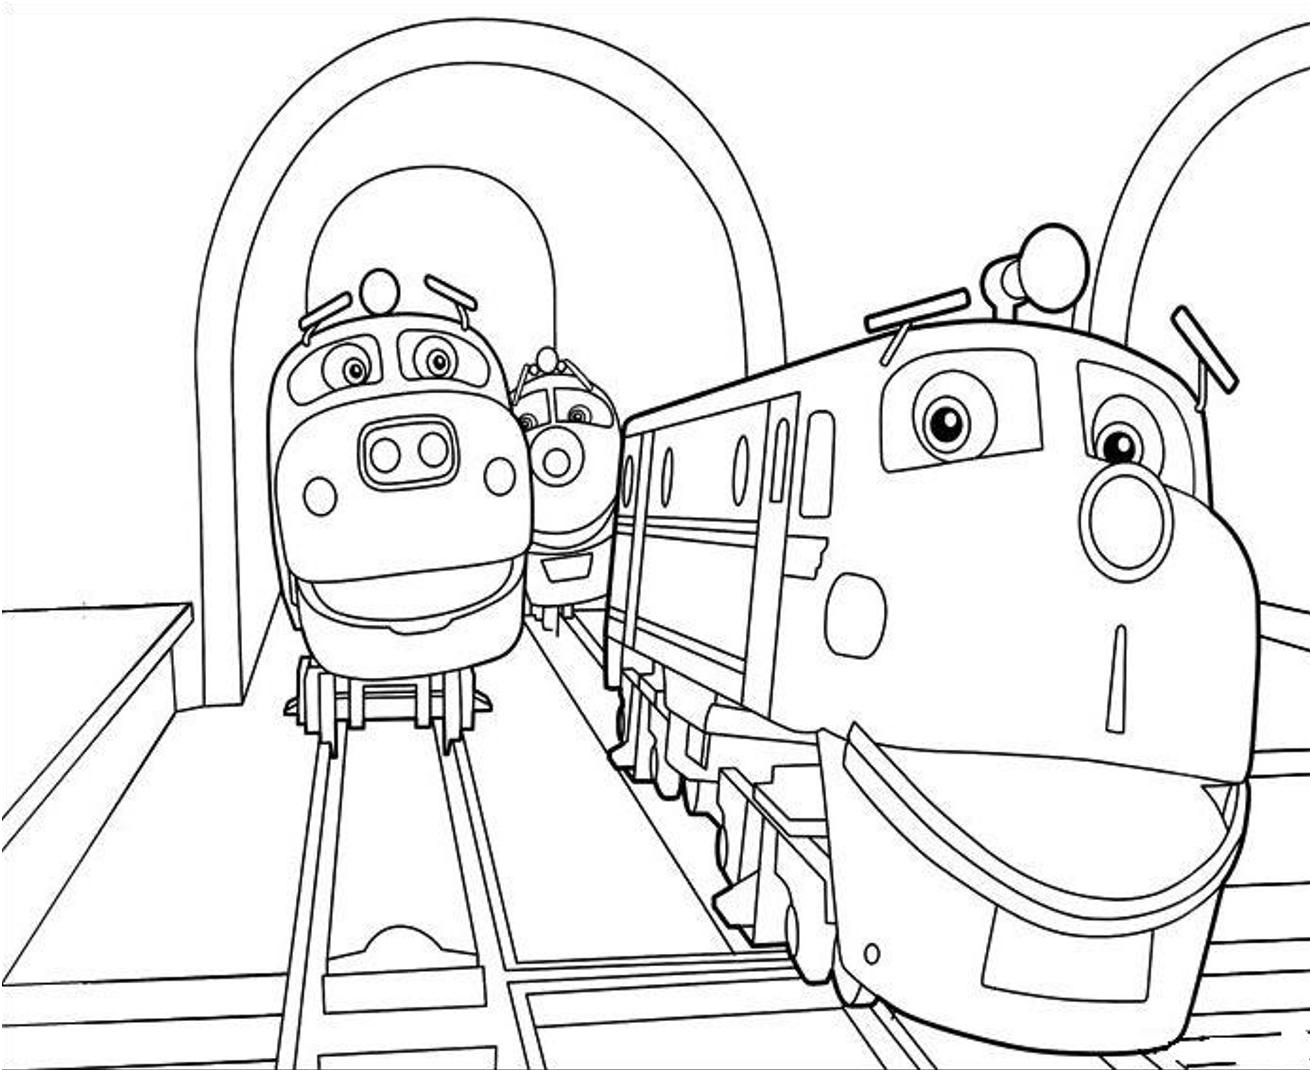 11 Prestigieux Coloriage De Train Image Image Coloriage Coloriage Train Coloriage